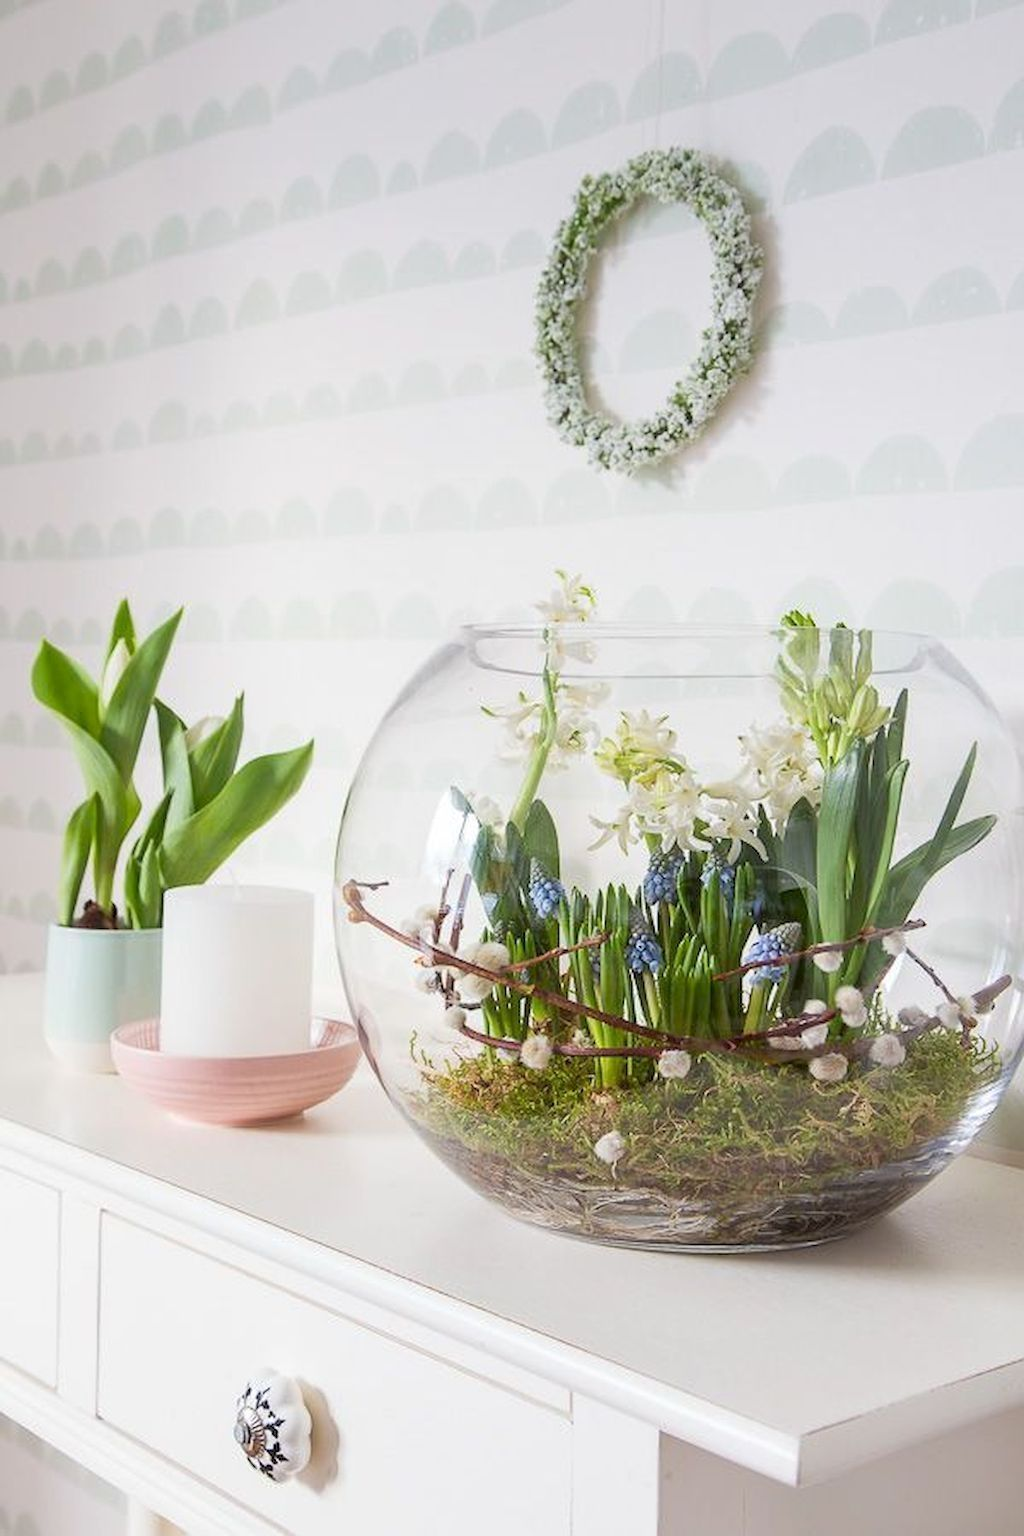 34easy diy spring decor ideas youll love spring decor